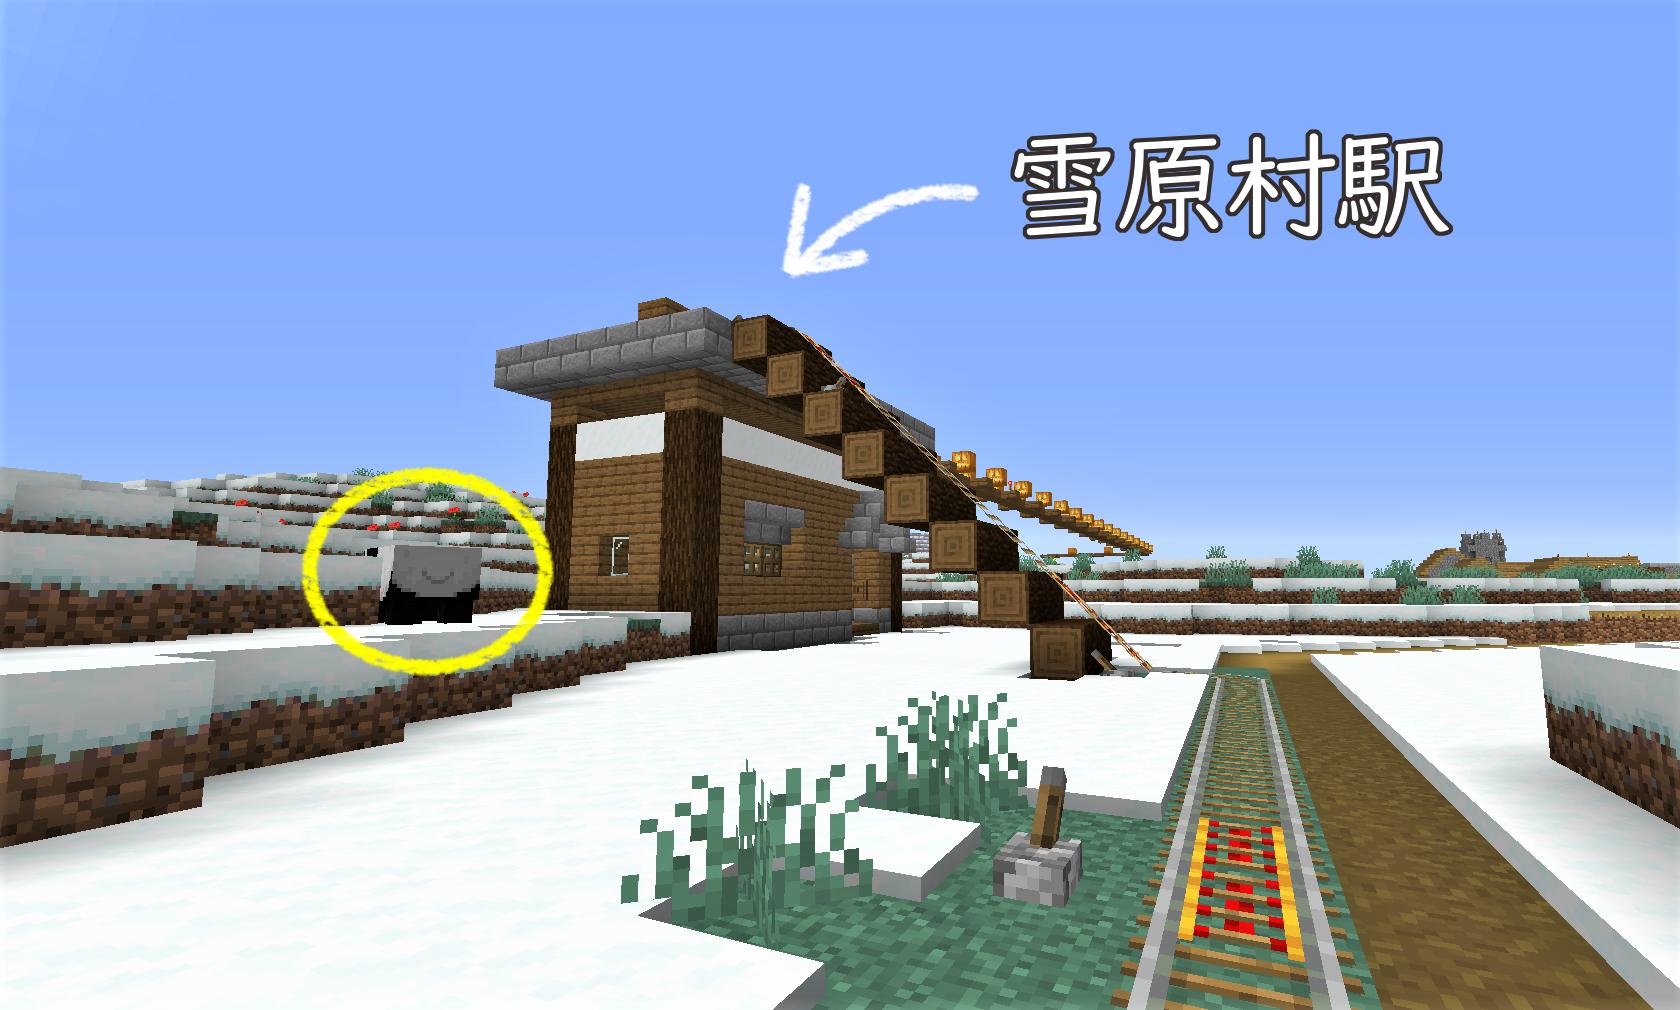 線路発見 雪原村へ.png